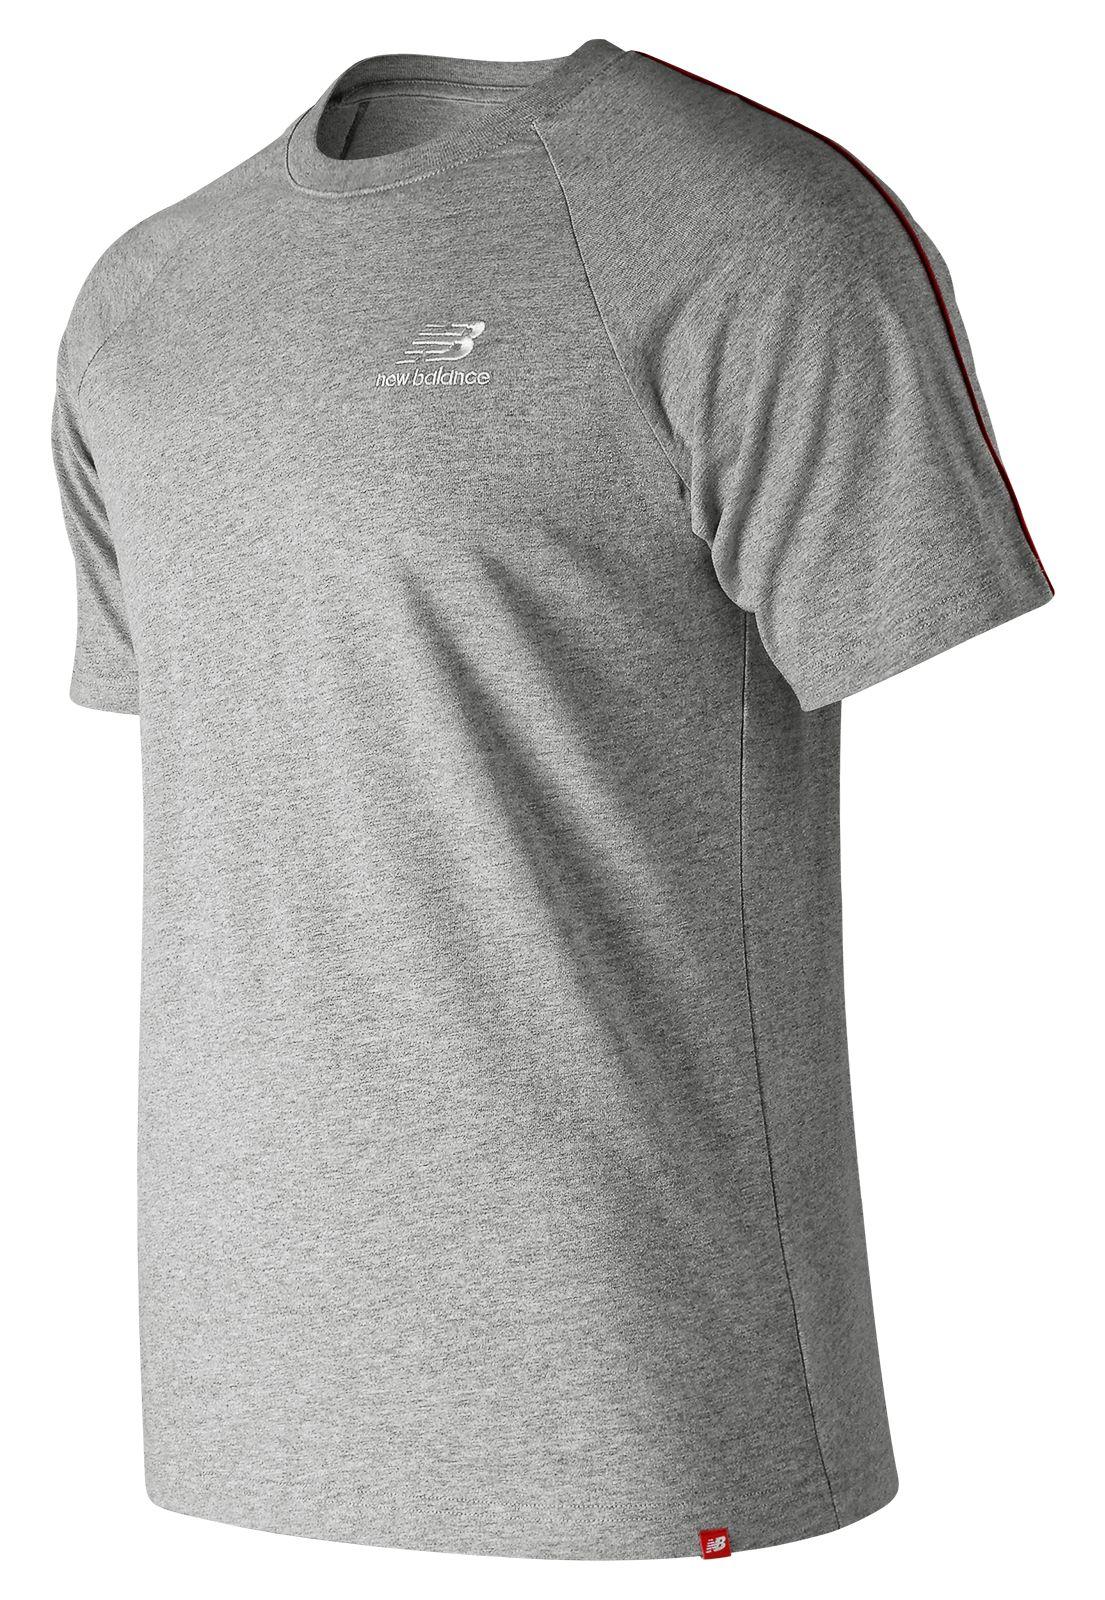 Men's Essentials Pinstripe Short Sleeve Tee